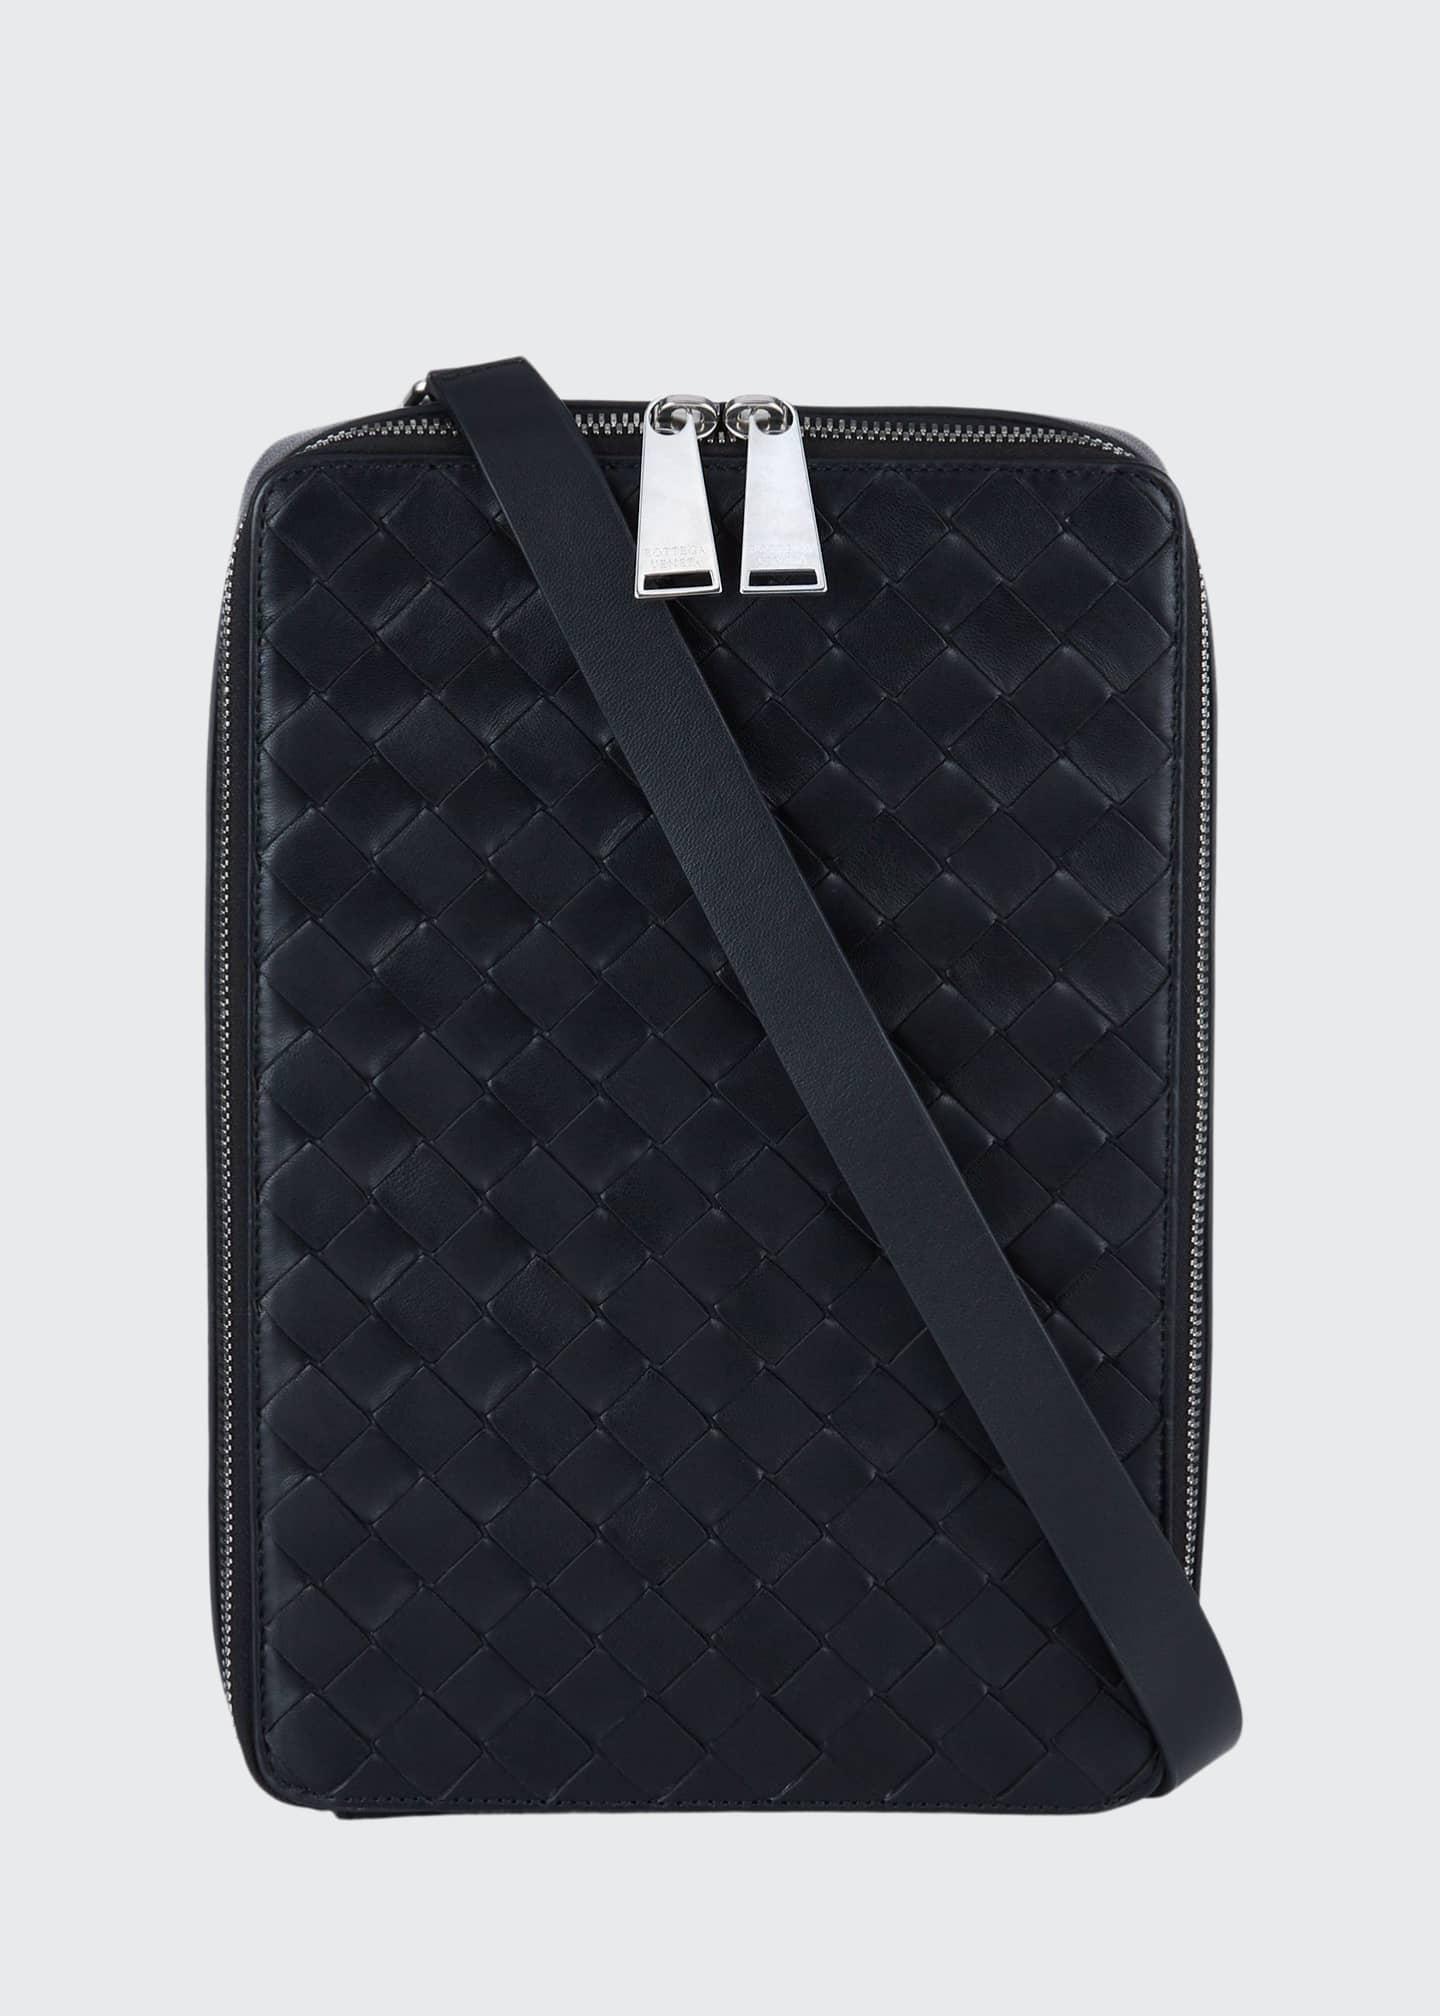 Bottega Veneta Men's Intrecciato Leather Crossbody Wallet